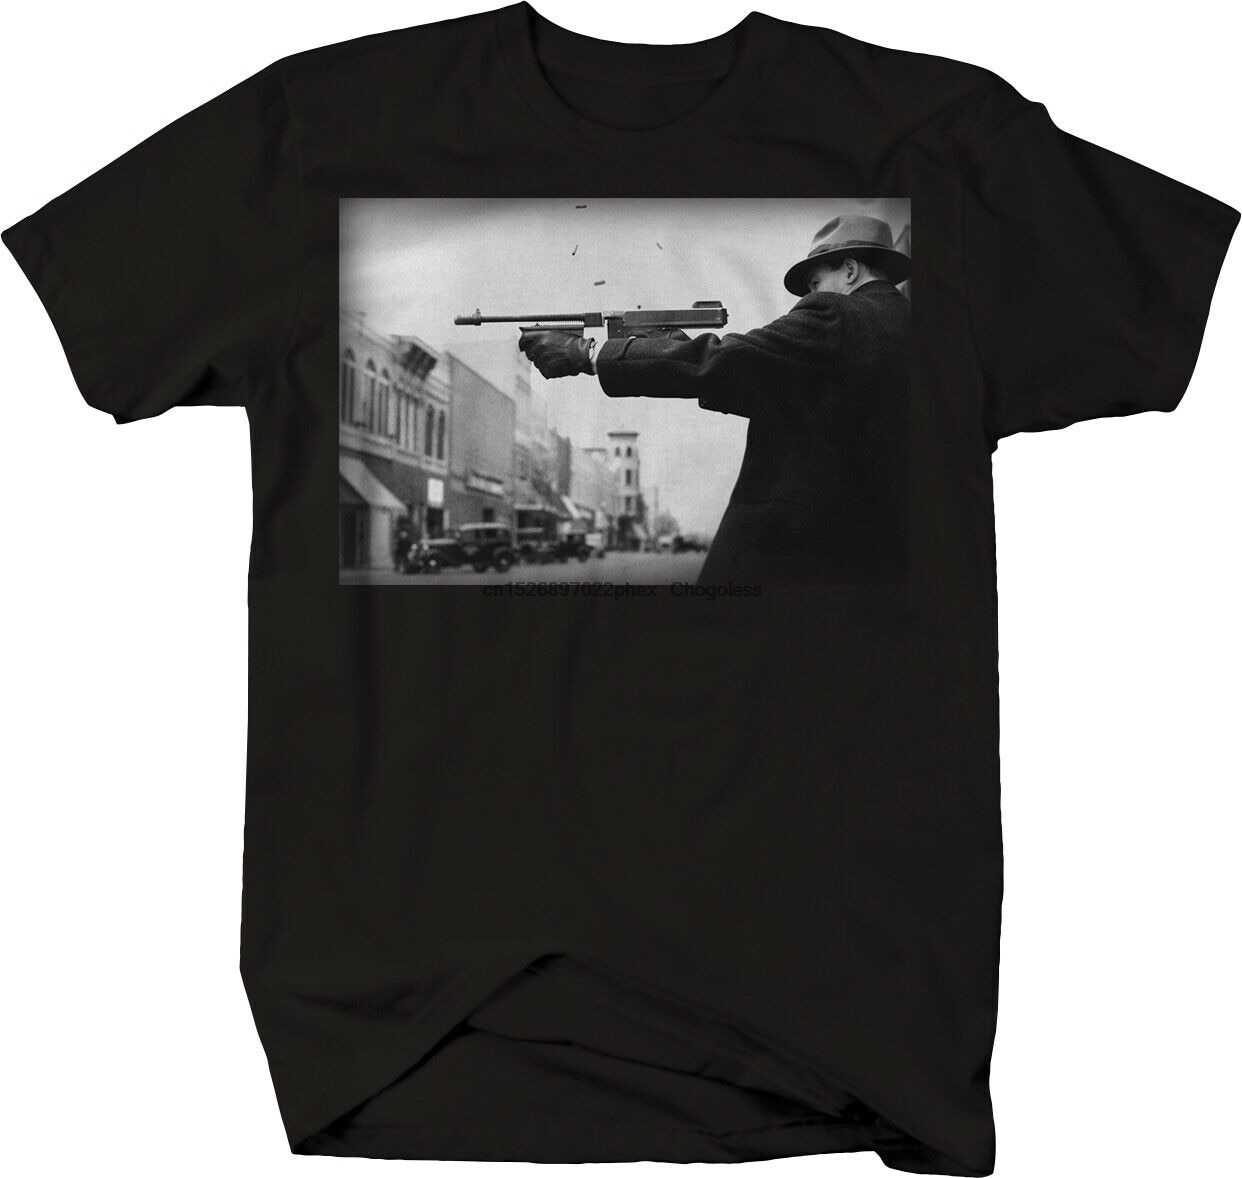 Gângster gangster tiro arma vintage rua gang t camisa